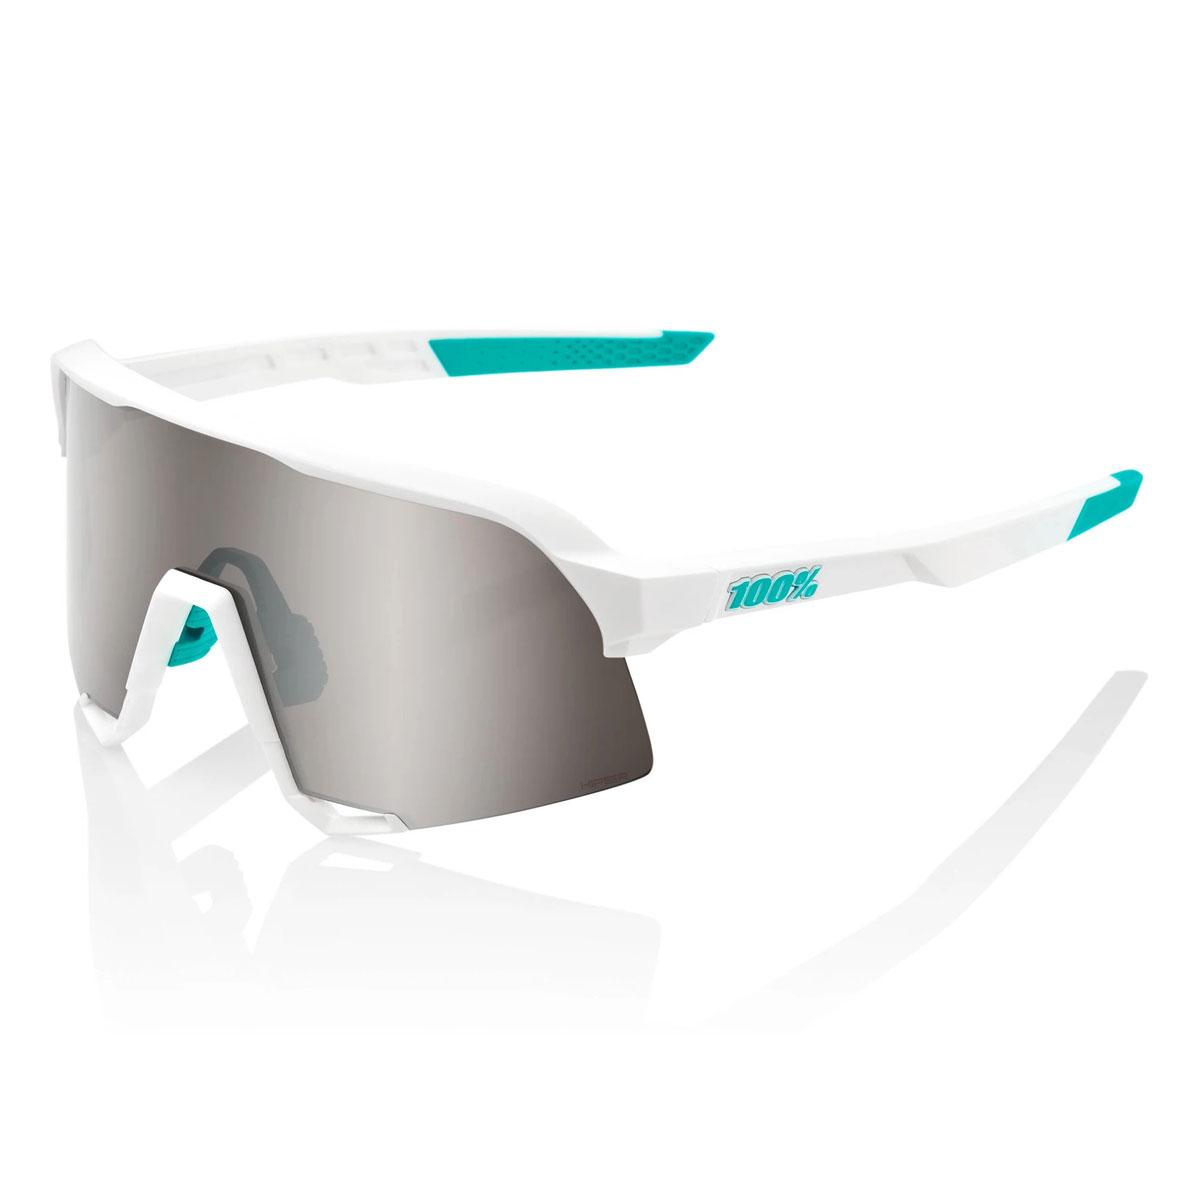 100% S3 HiPER Mirror Gafas - BORA-hansgrohe Special Edition - Team White